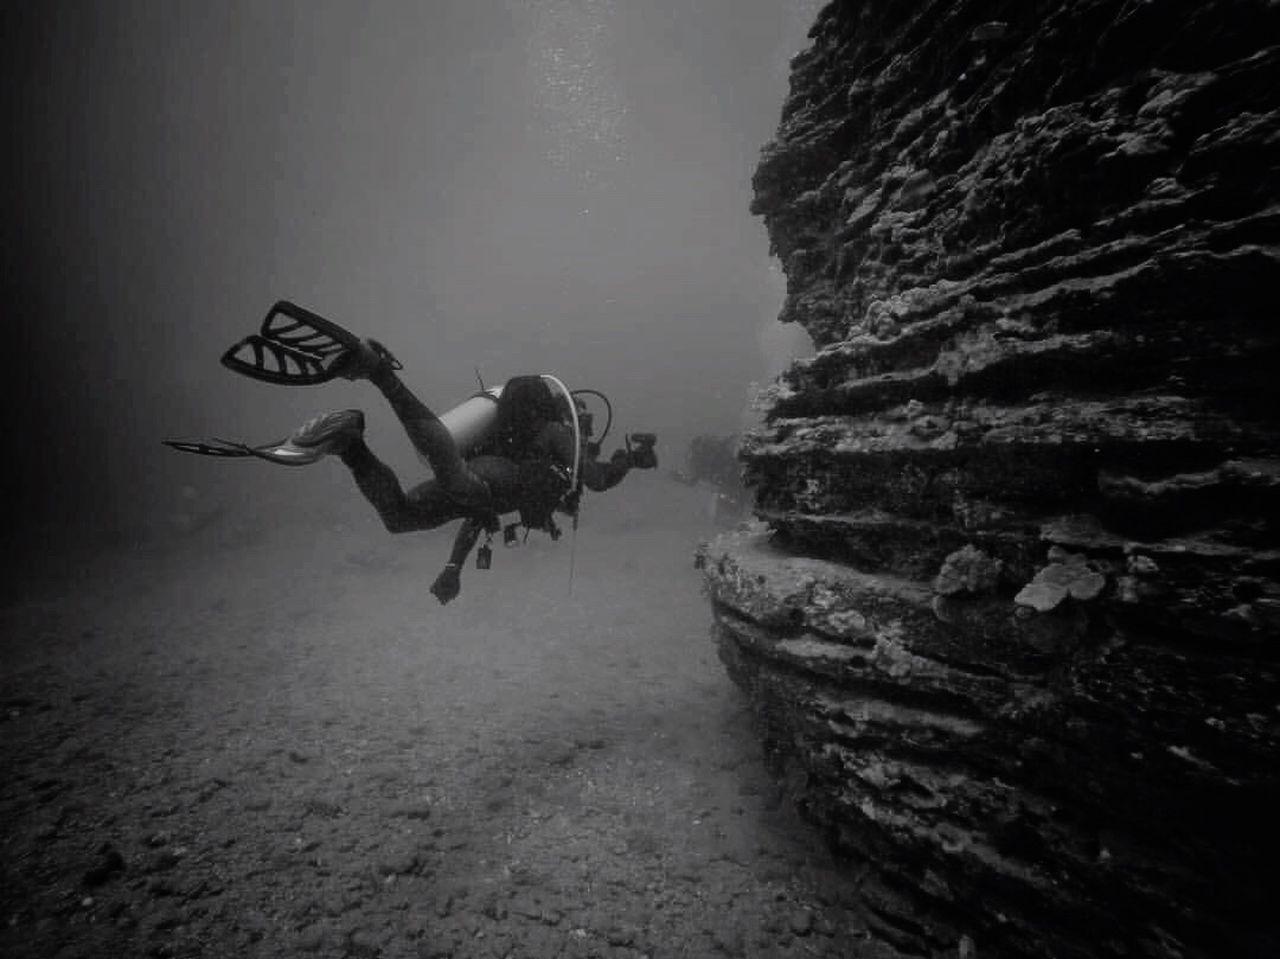 Sea Scuba Diving UnderSea Underwater Adventure Rock - Object Water Beach Full Length Swimming Nature Day Outdoors Oahu LivingLife EyeEm Best Shots EyeEm Nature Lover Scubadiver SCUBA Scubadiving Underwater Photography Enjoying Life